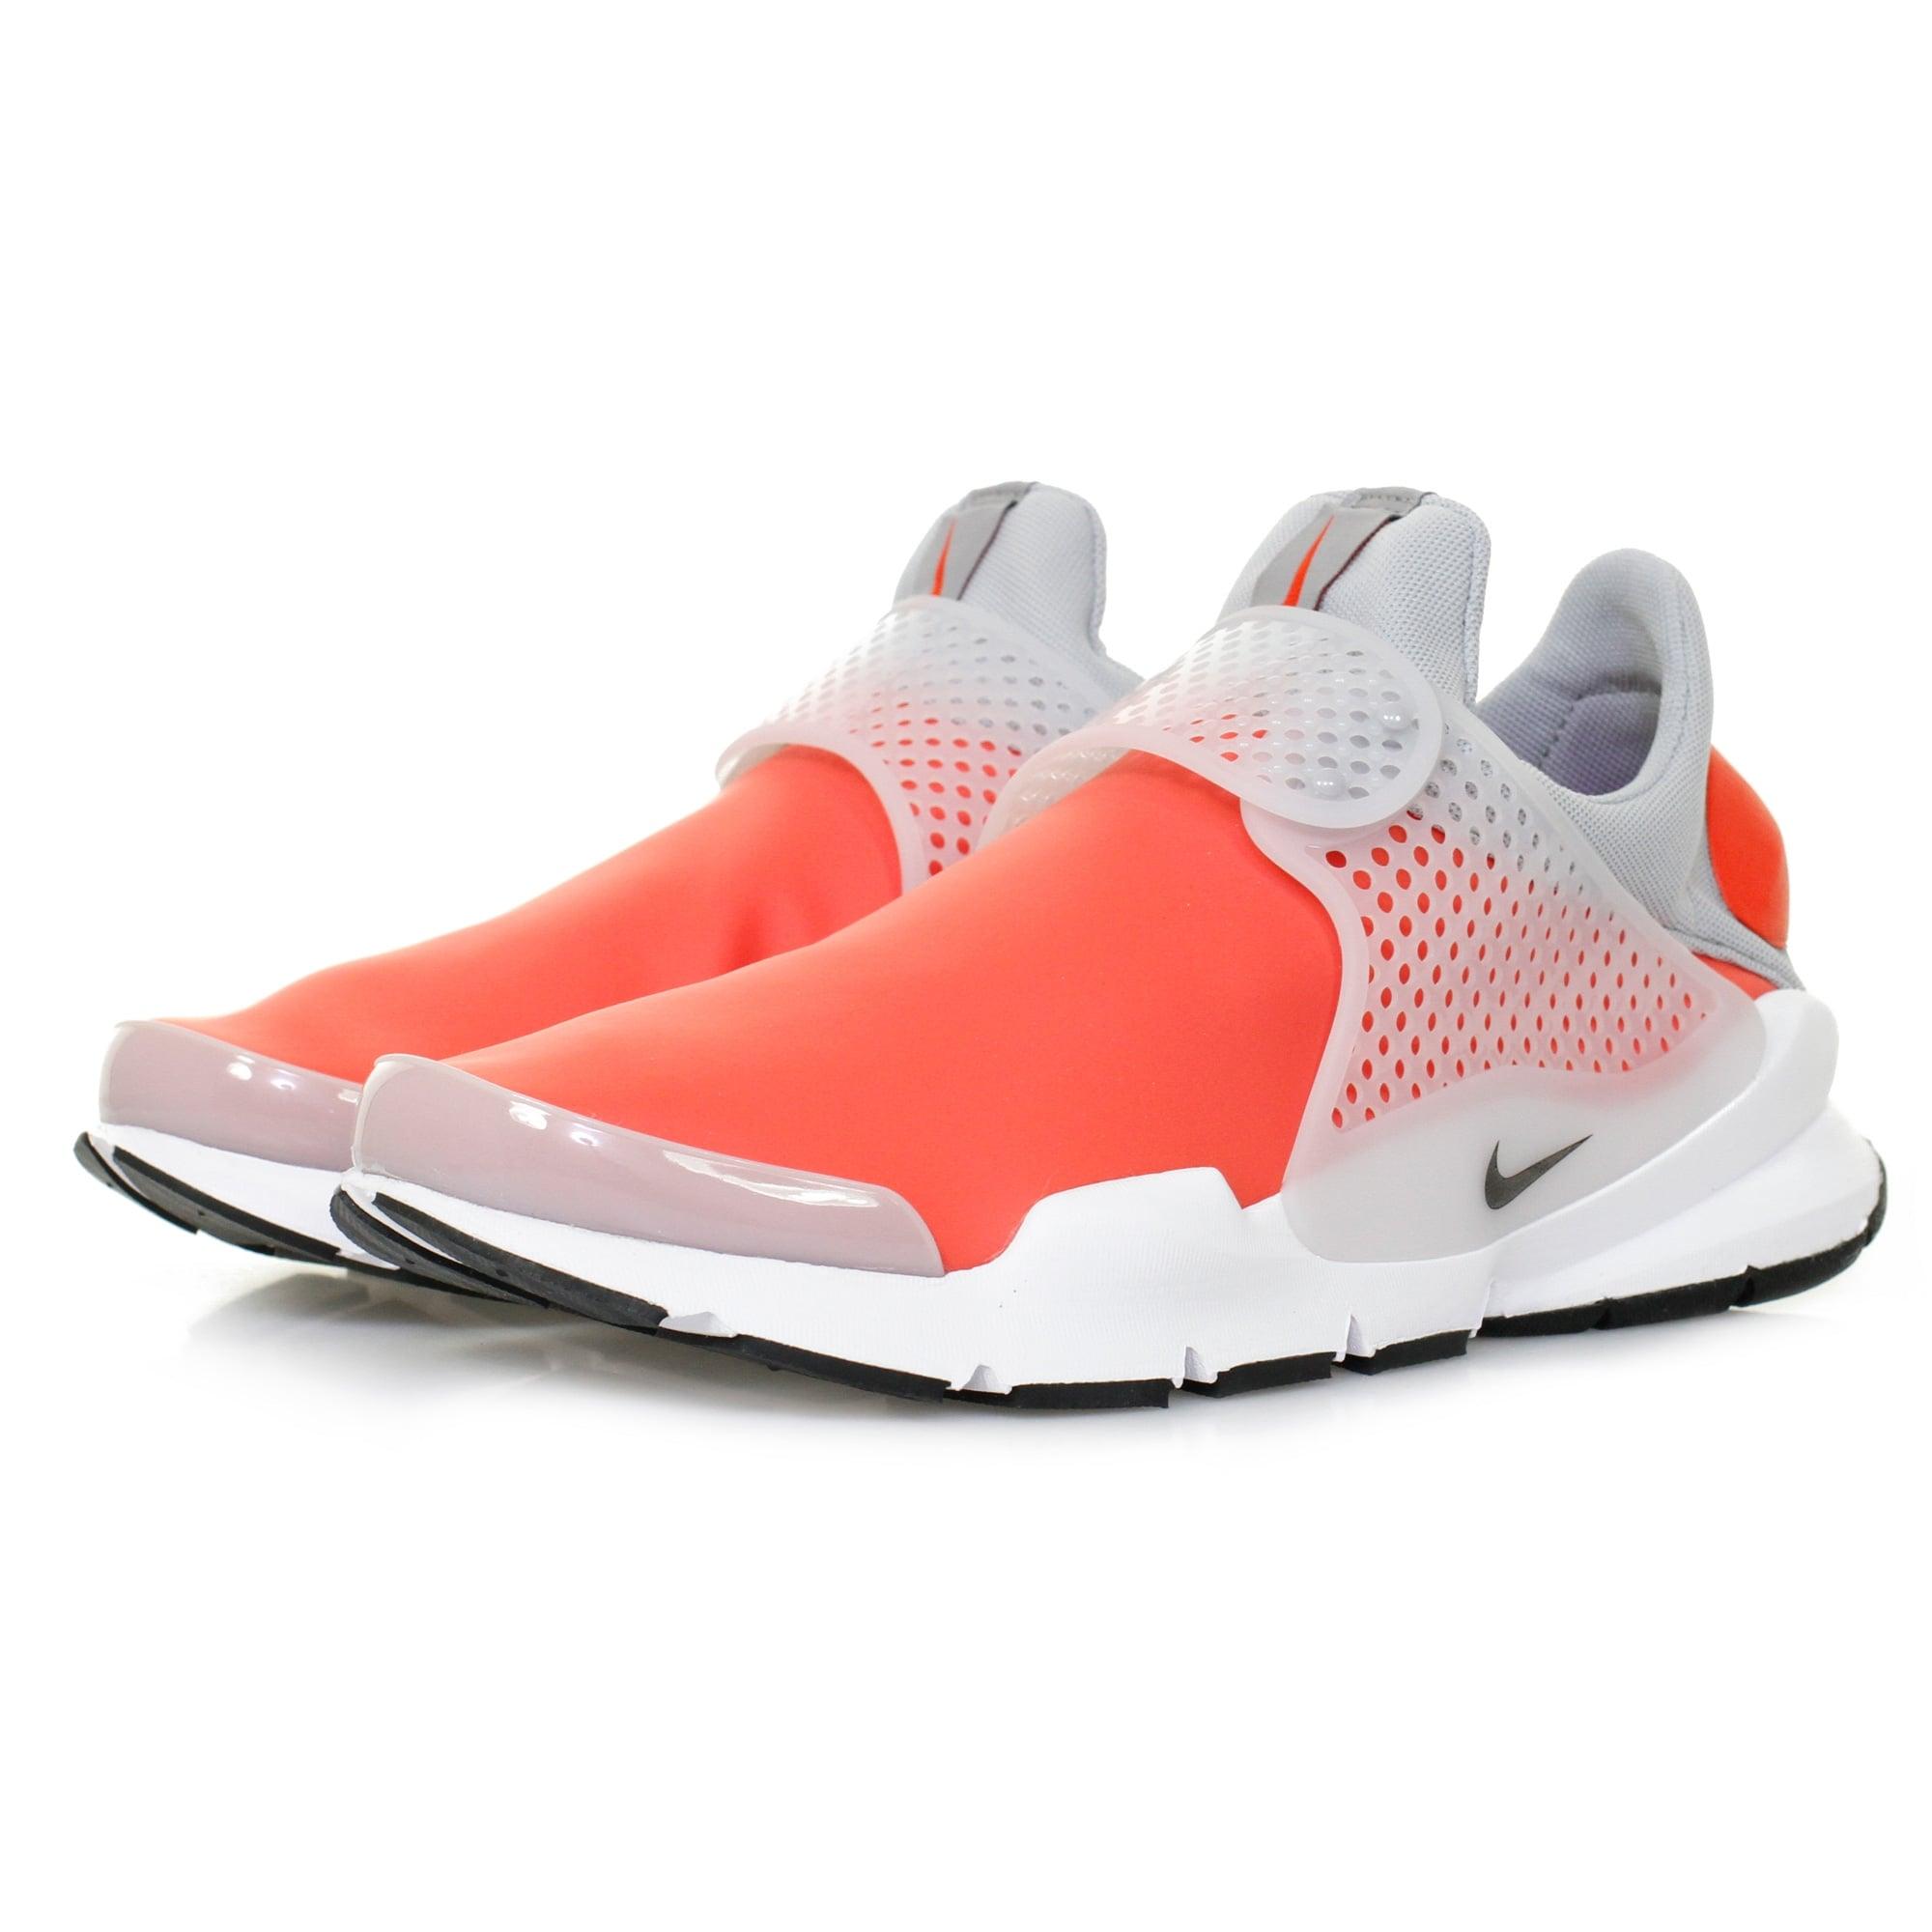 Nike Sock Dart SE Max Orange Shoe 911404 800